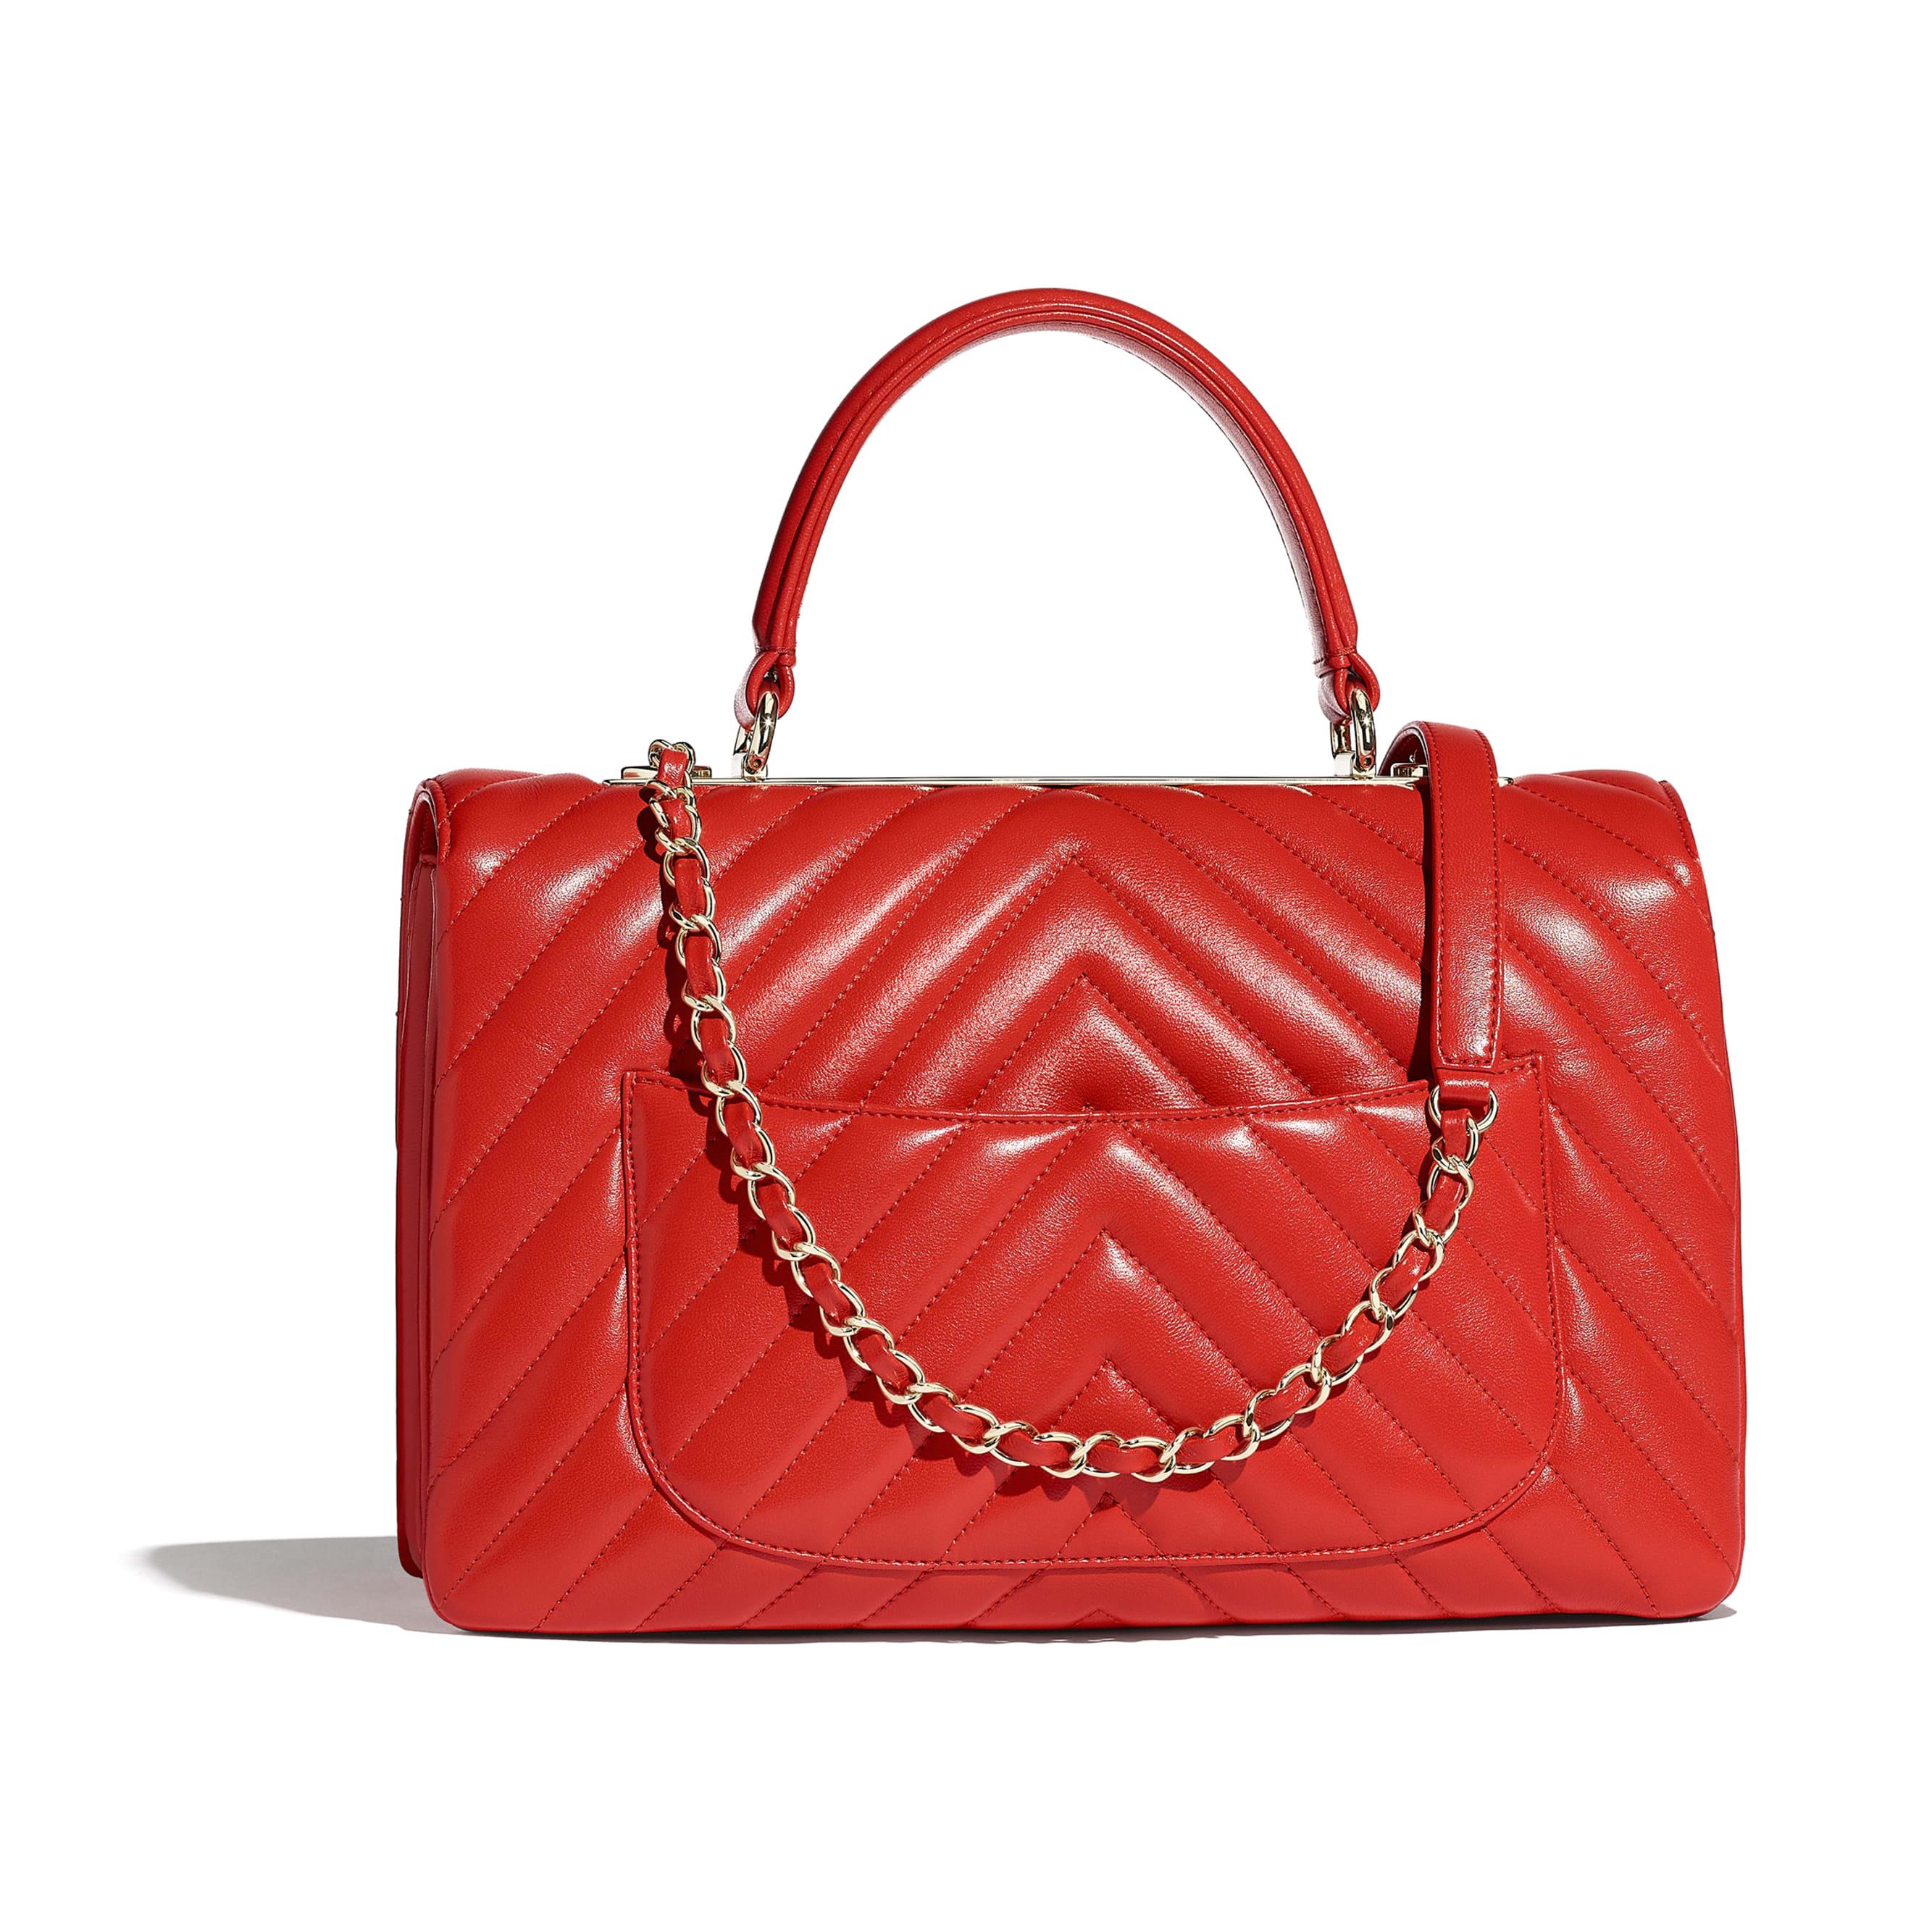 ... Flap Bag with Top Handle - Red - Lambskin   Gold-Tone Metal -  Alternative e1289b09f296c